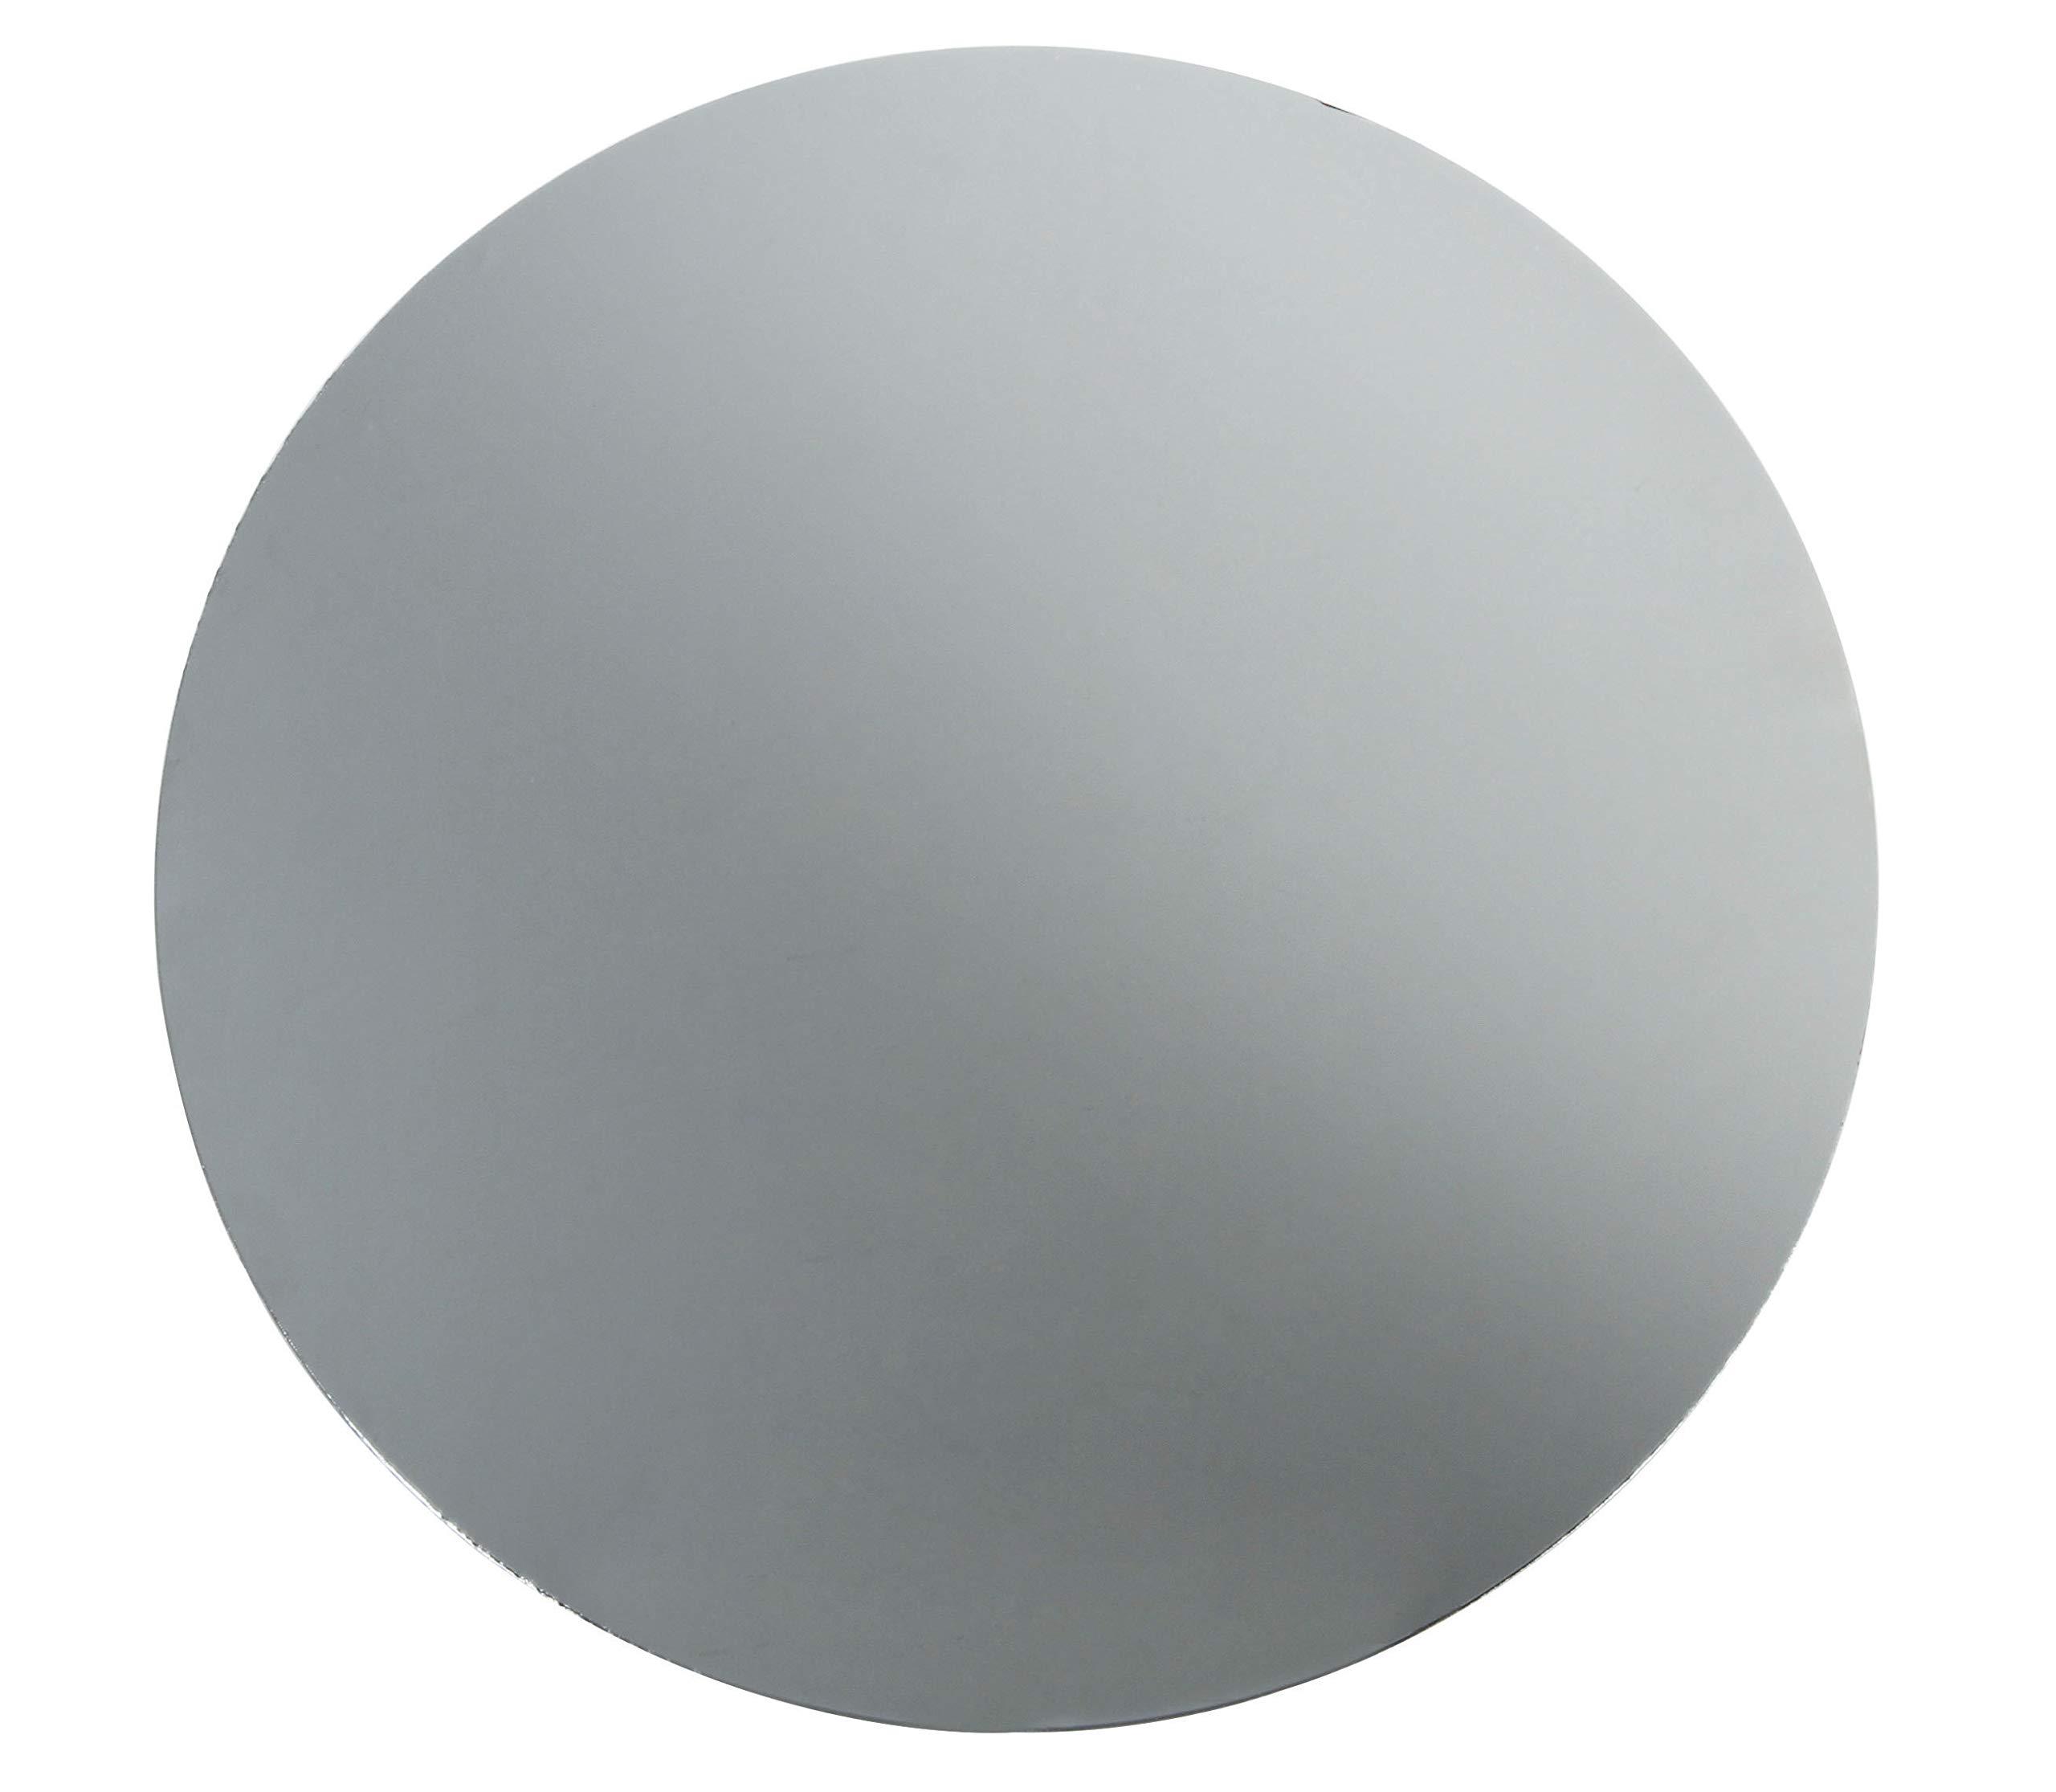 Darice Glass 7 inch Round Mirror